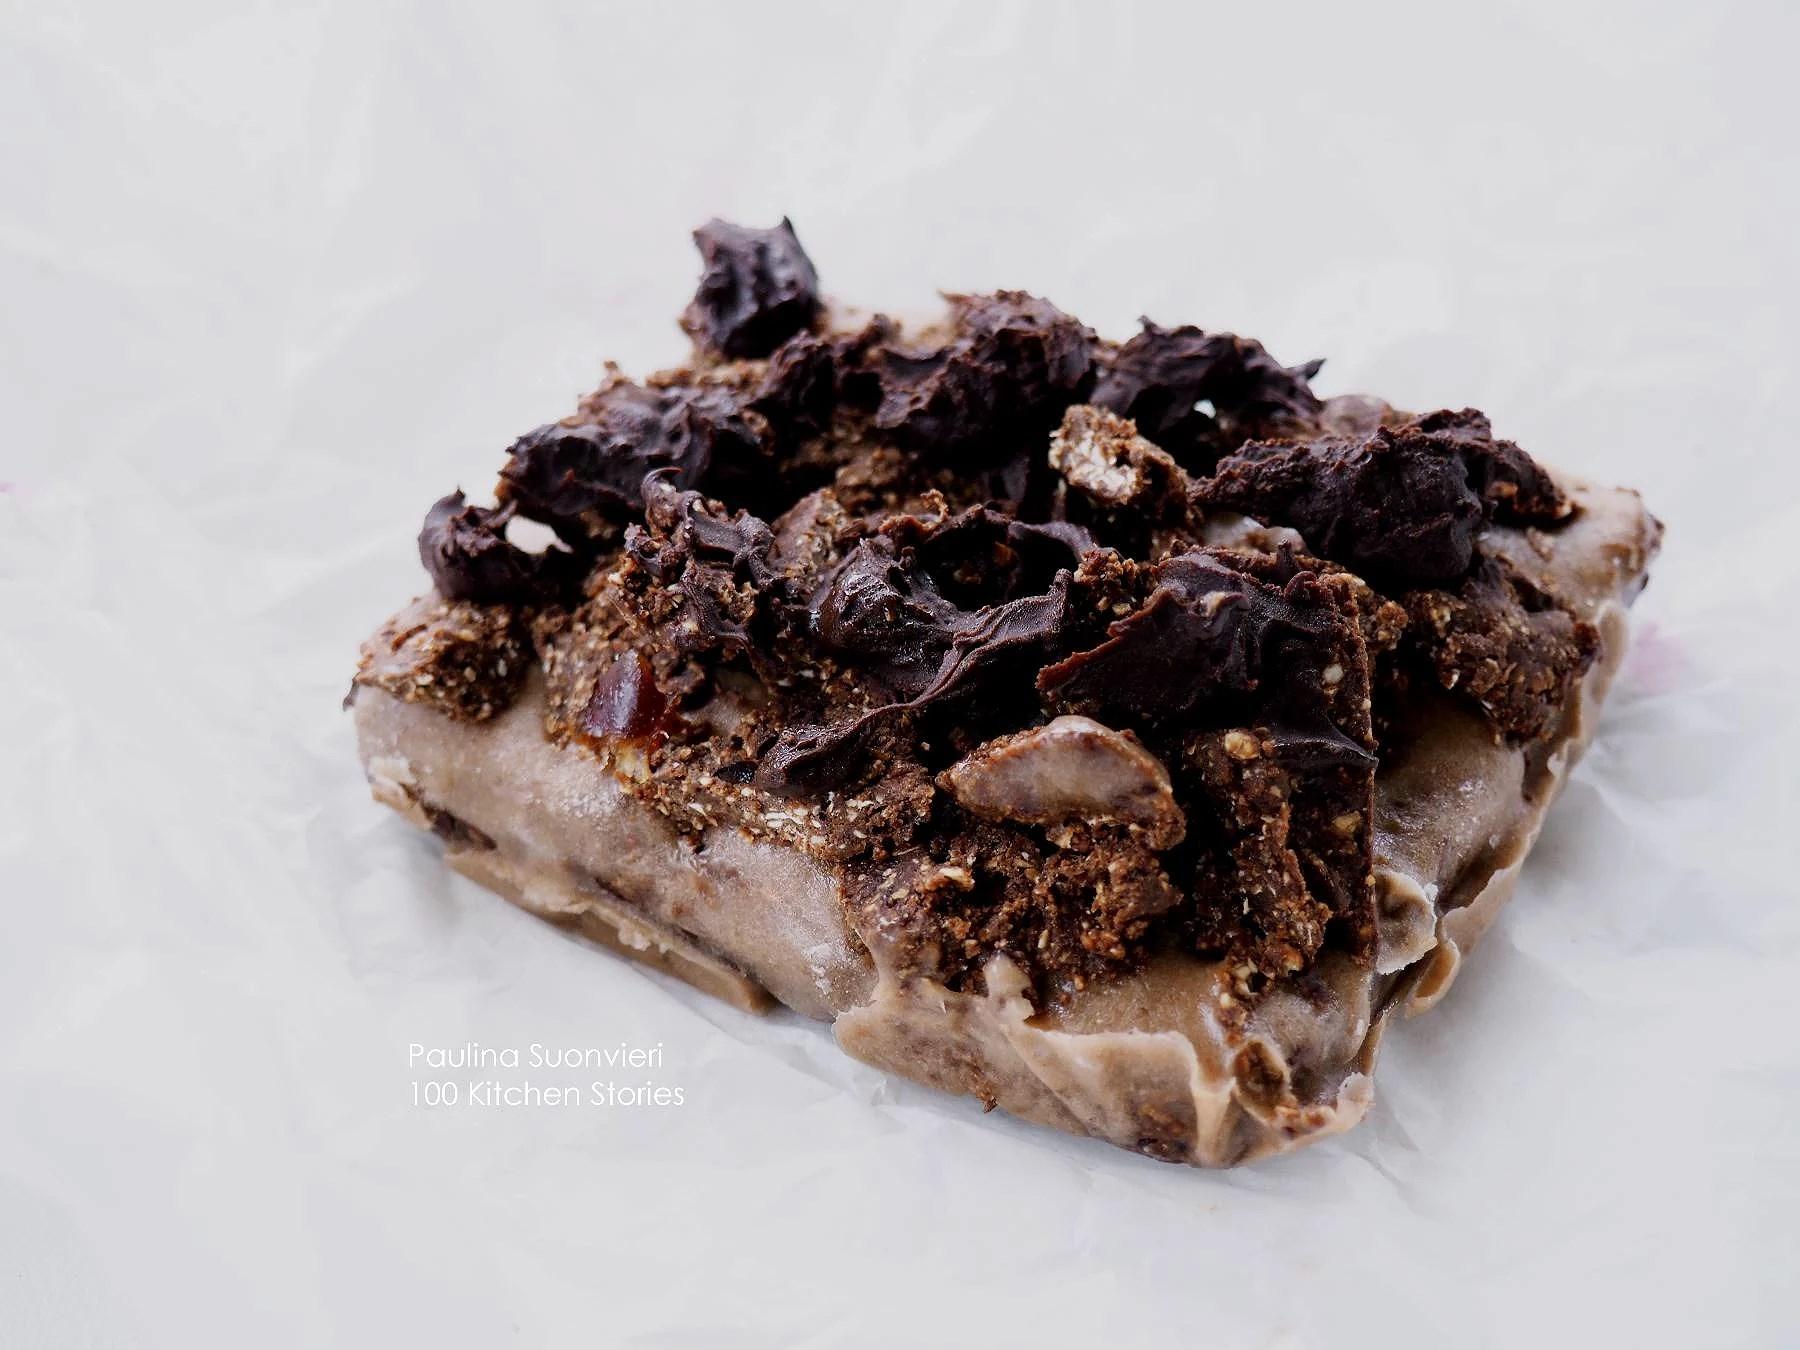 Vegan Brownie with Ice Cream, Brownie Bites and Chocolate